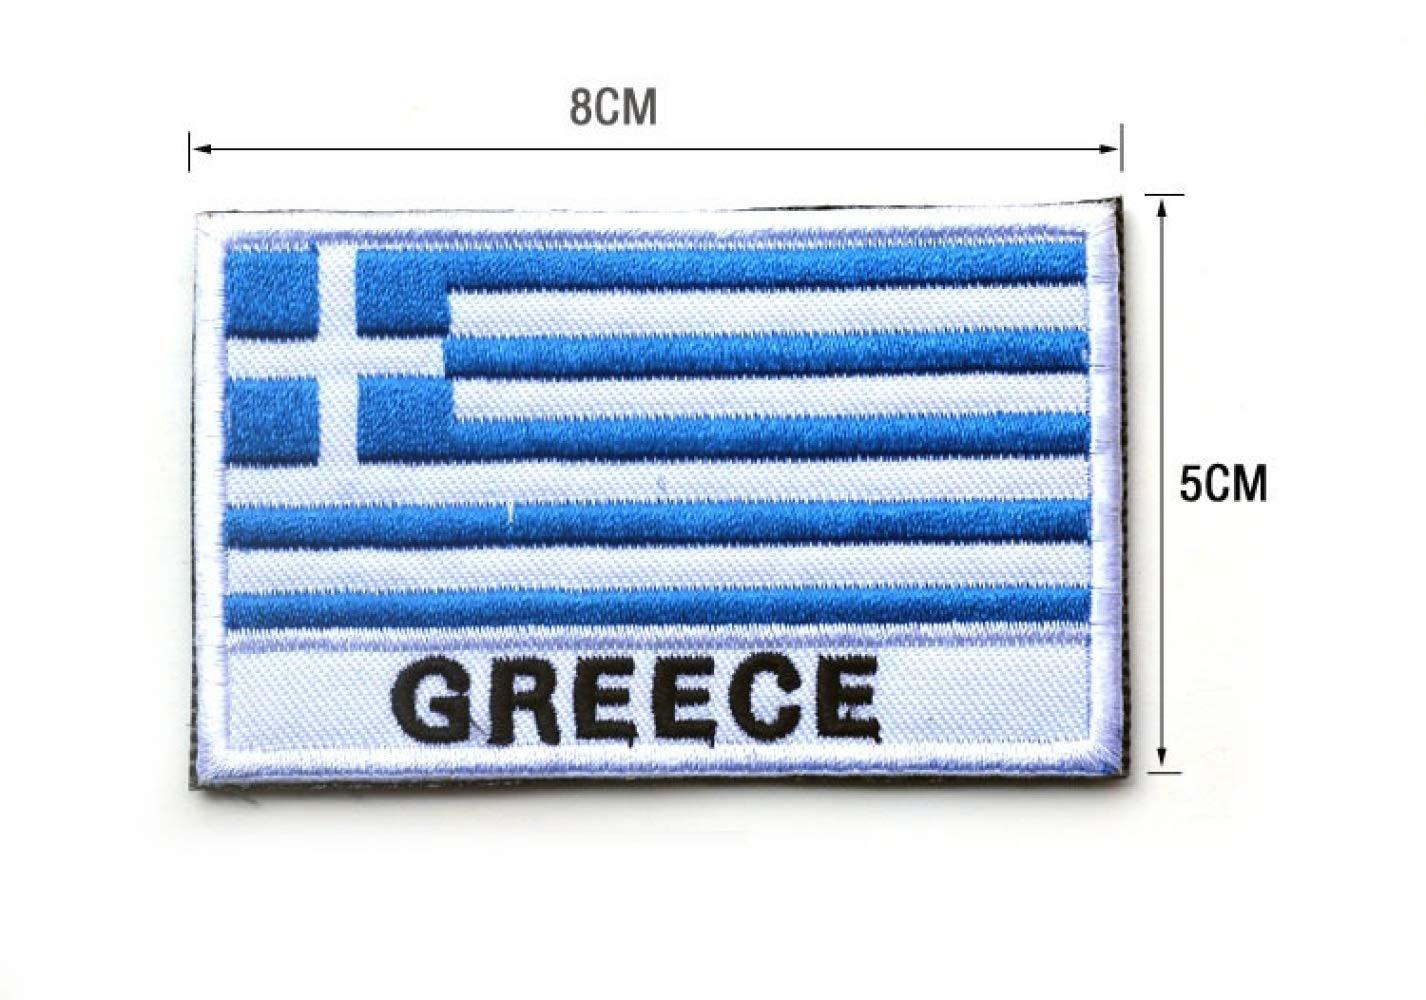 Drapeau Badge Badge Velcro Broderie Tissu Badge Brassard Collant Et Prêt À Utiliser